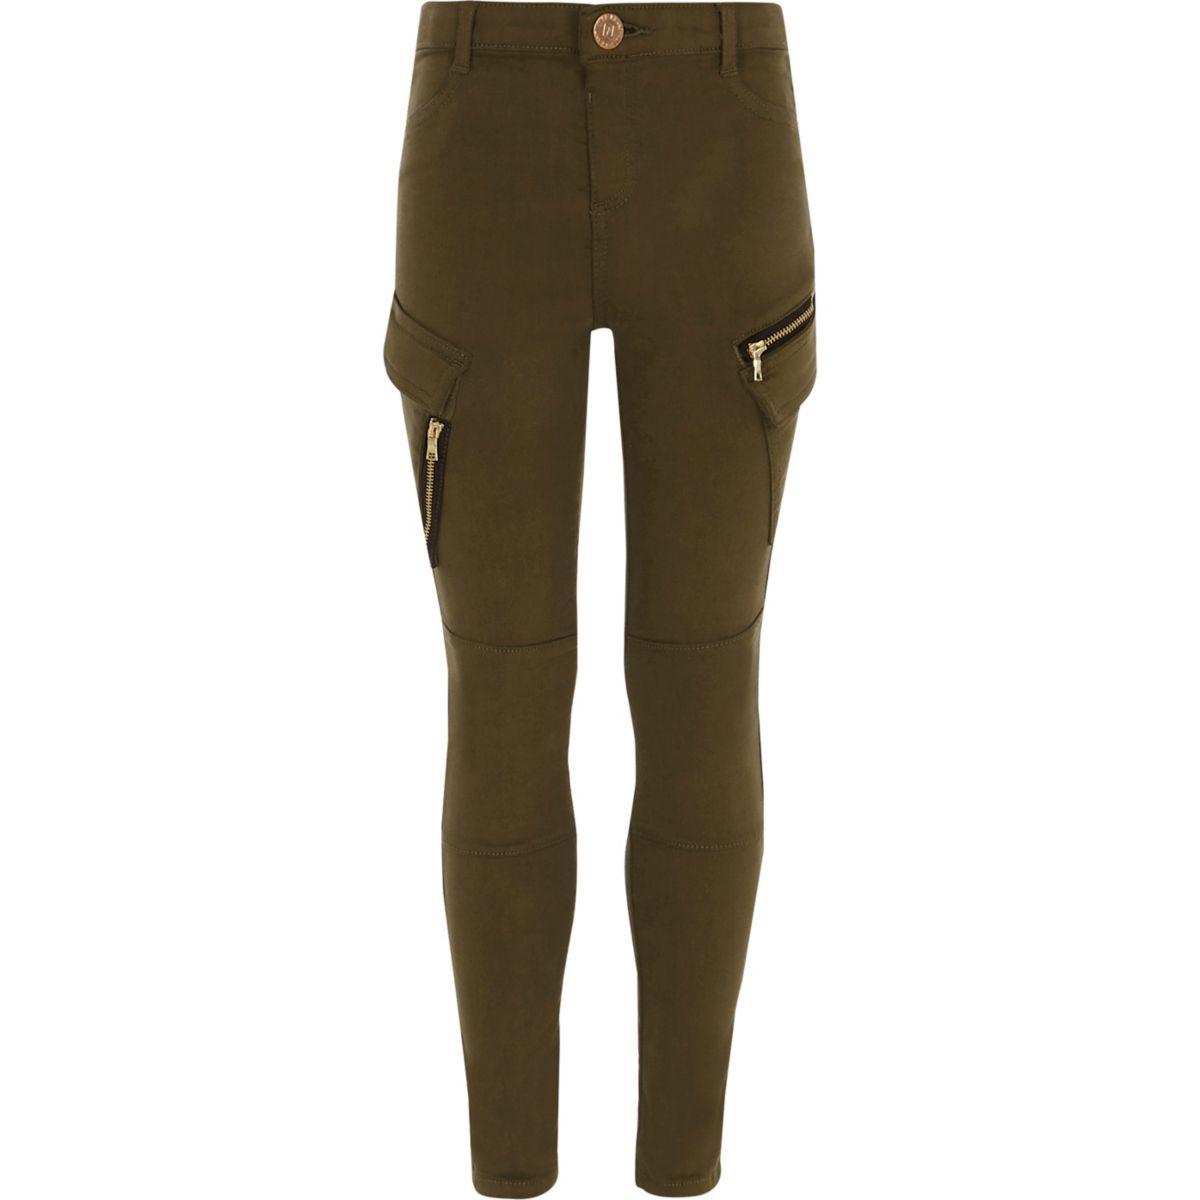 Girls khaki skinny fit cargo trousers